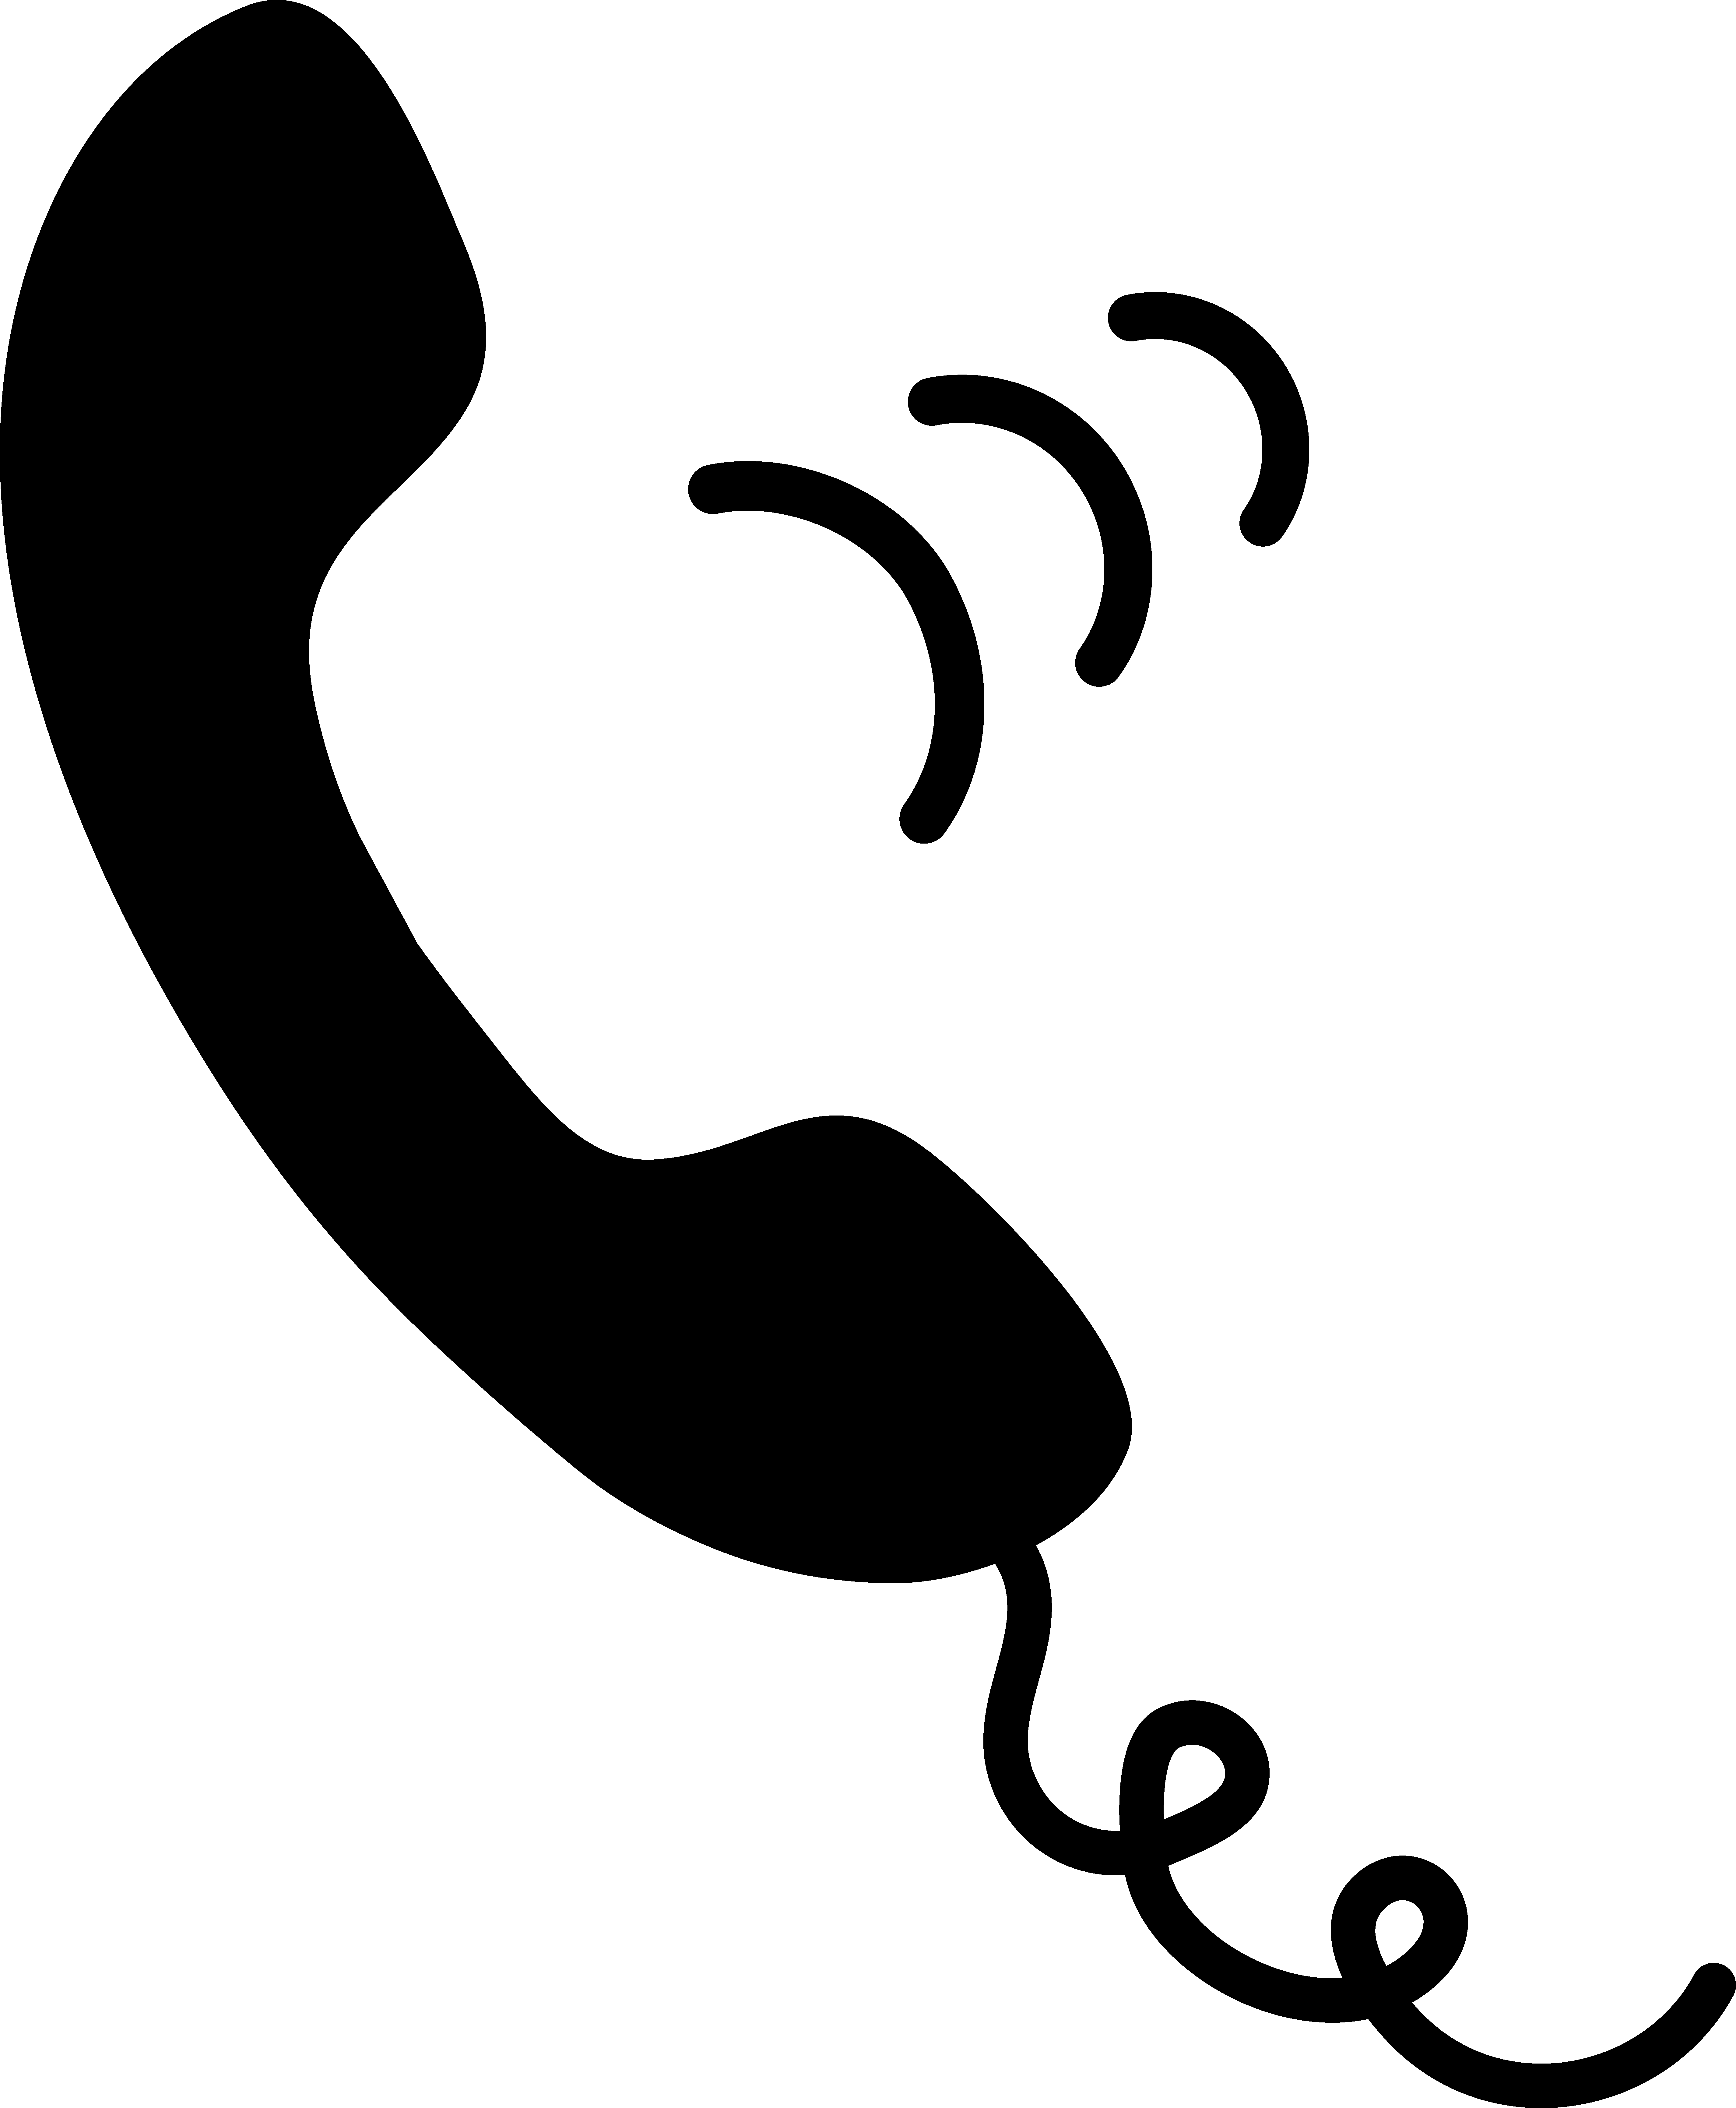 5702x6922 Simple Ringing Phone Icon